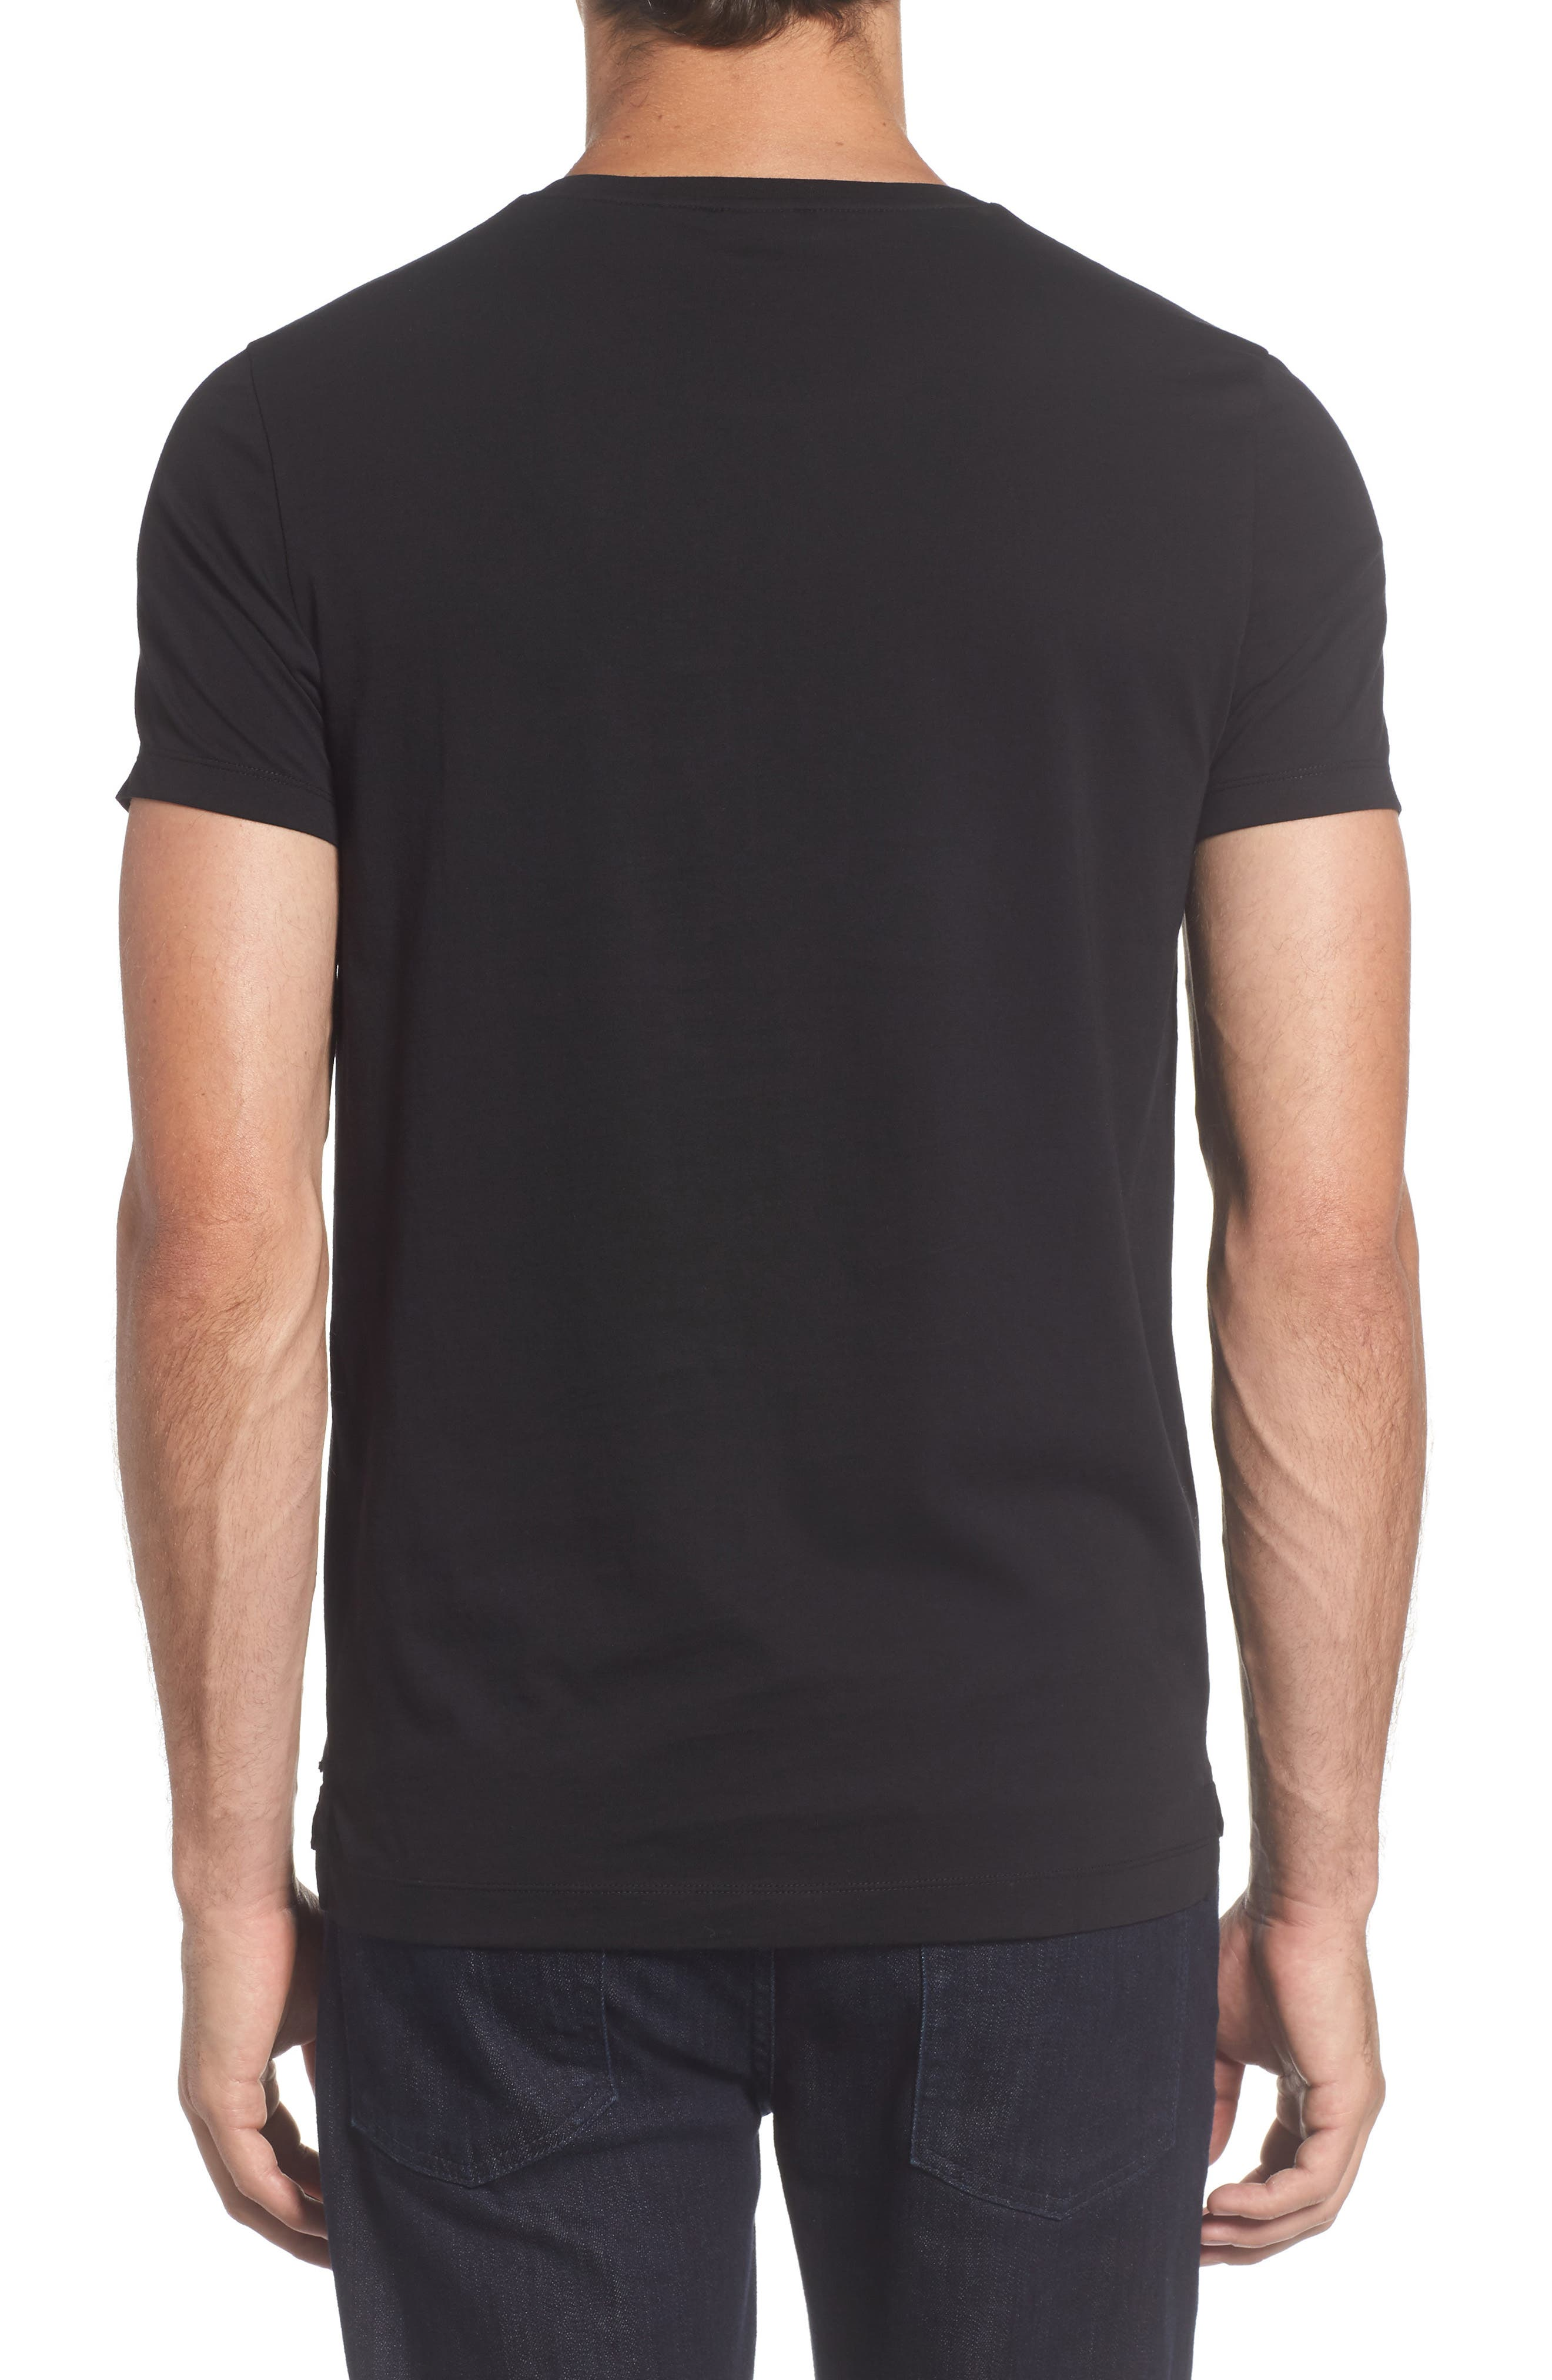 Tessler Crewneck T-Shirt,                             Alternate thumbnail 12, color,                             Black